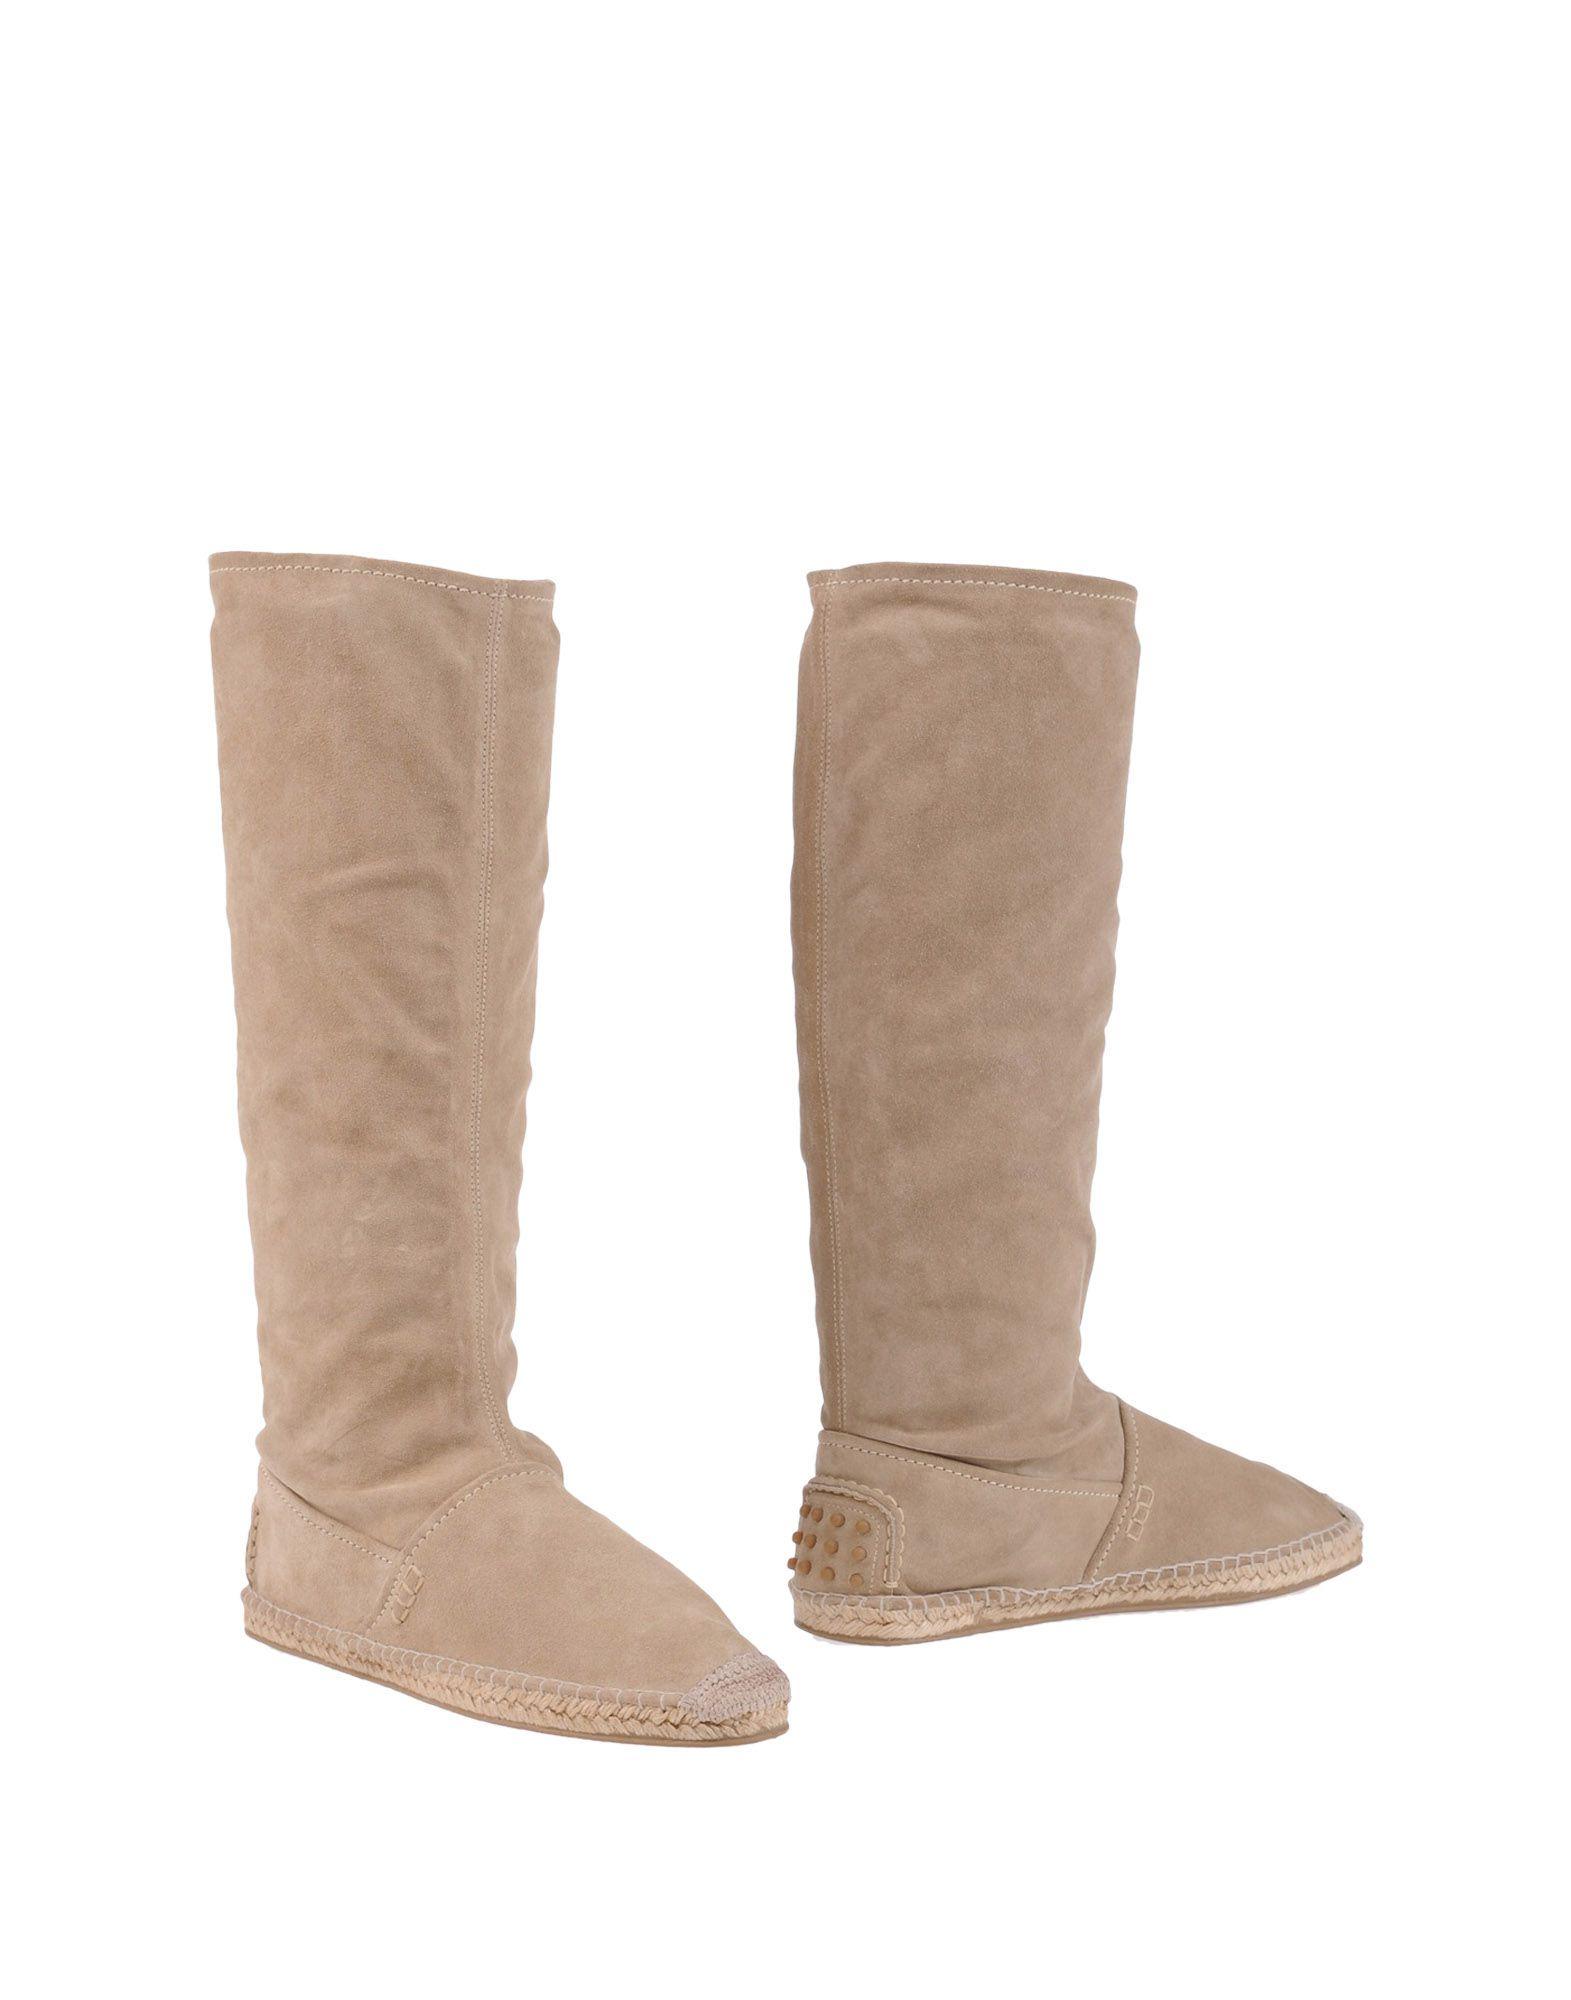 Moda Stivali Carshoe Carshoe Carshoe Donna - 11156309RH 42cc5a